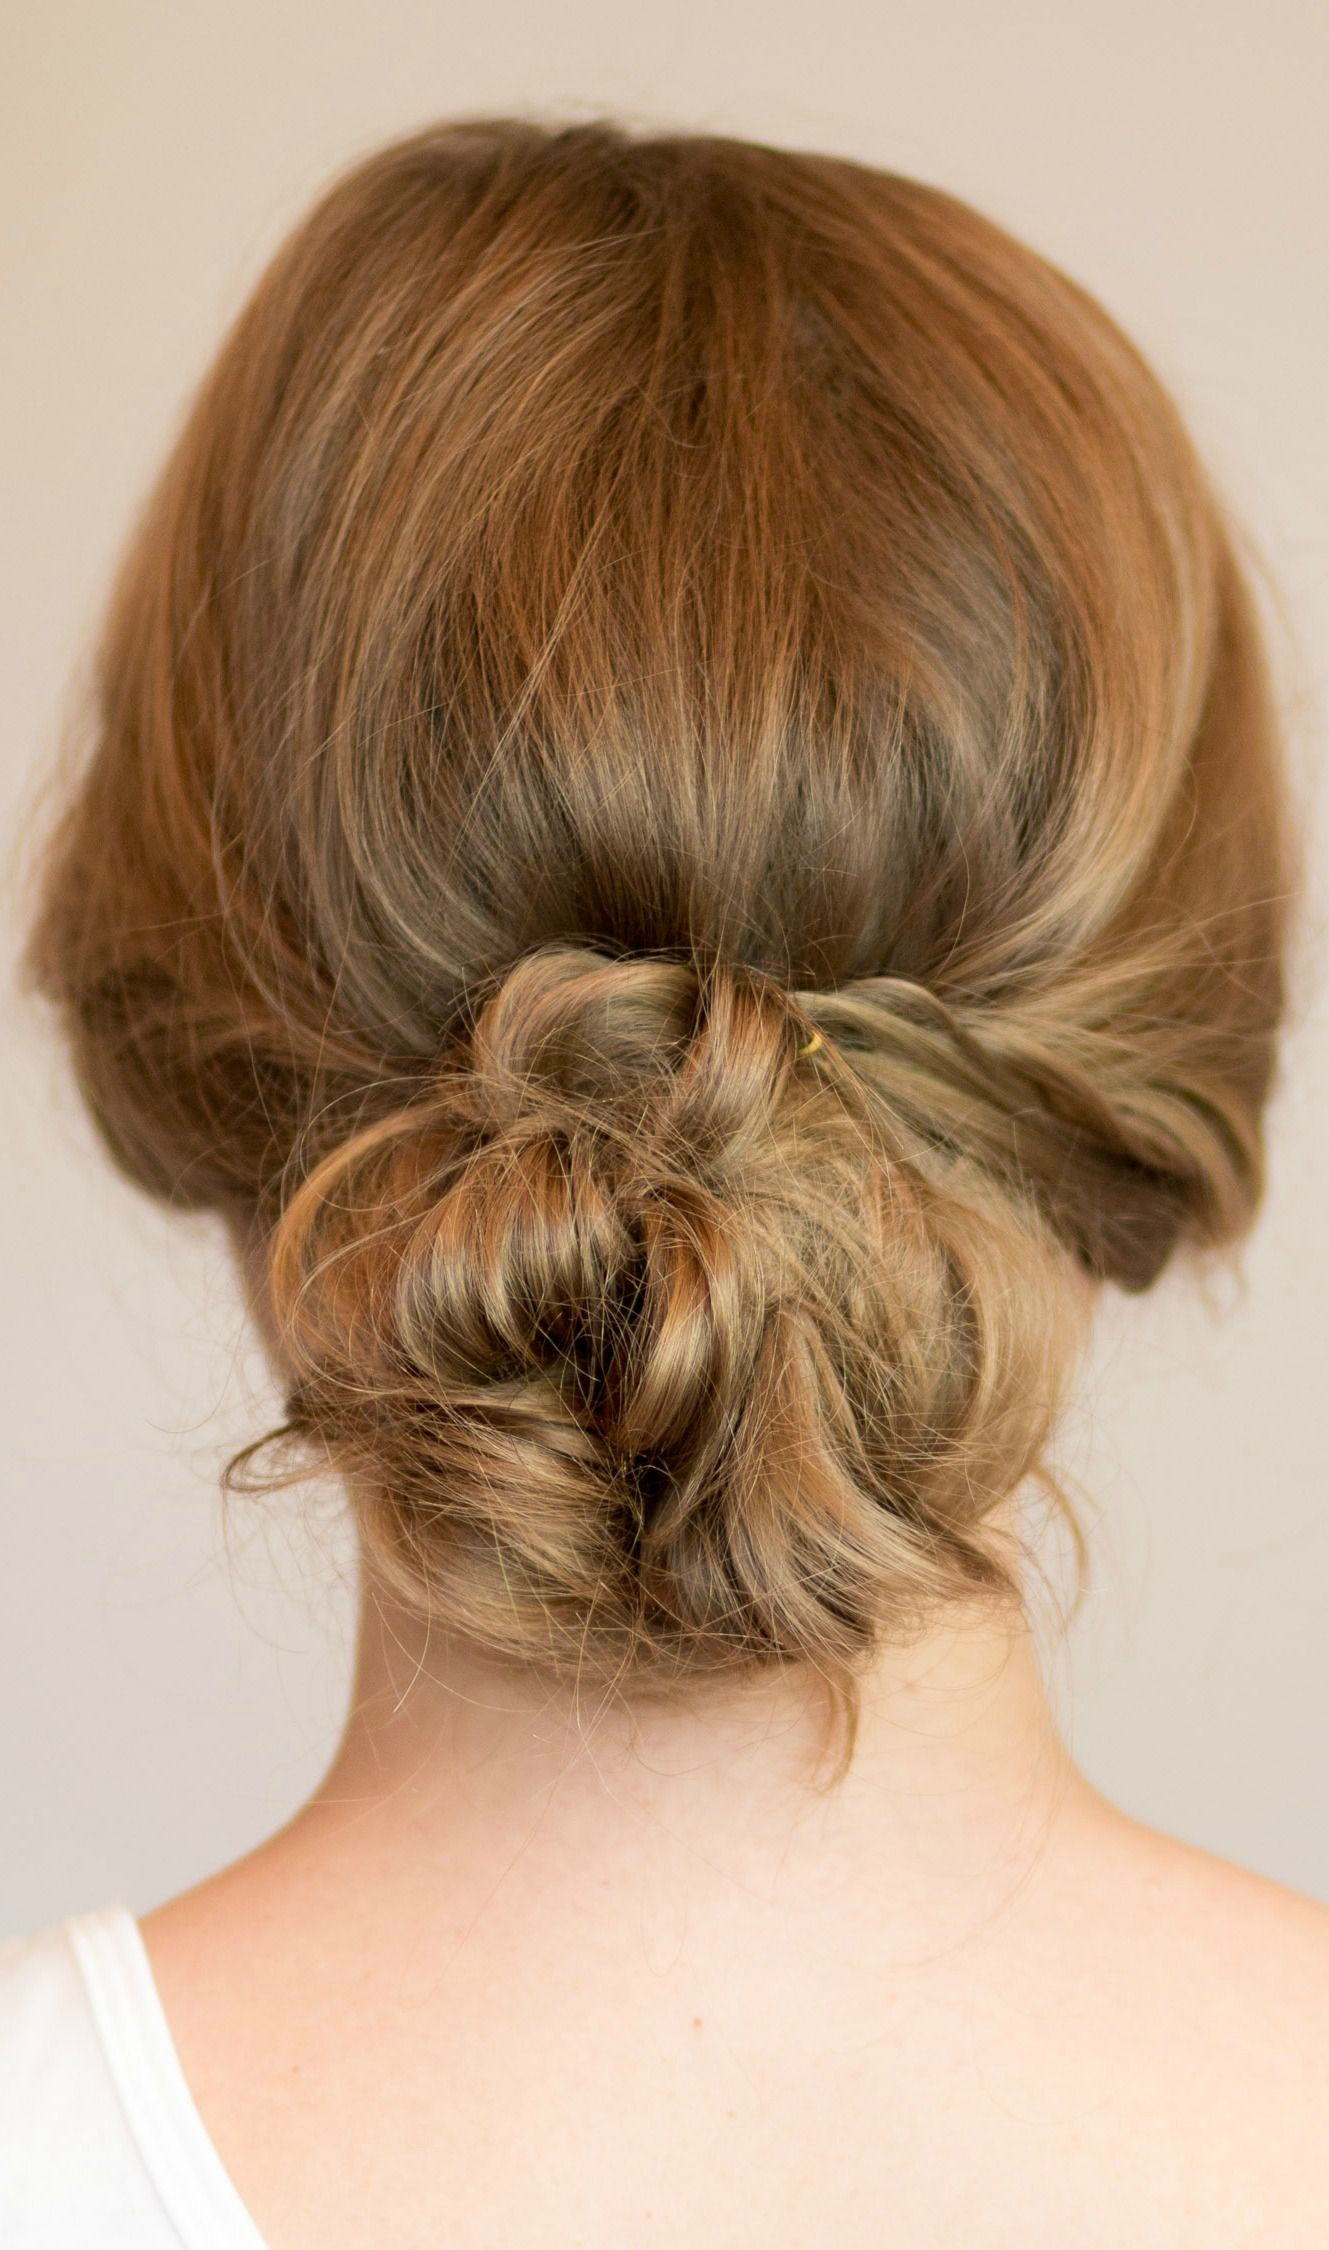 Easy heatless hairstyles for long hair faux braids easy hair